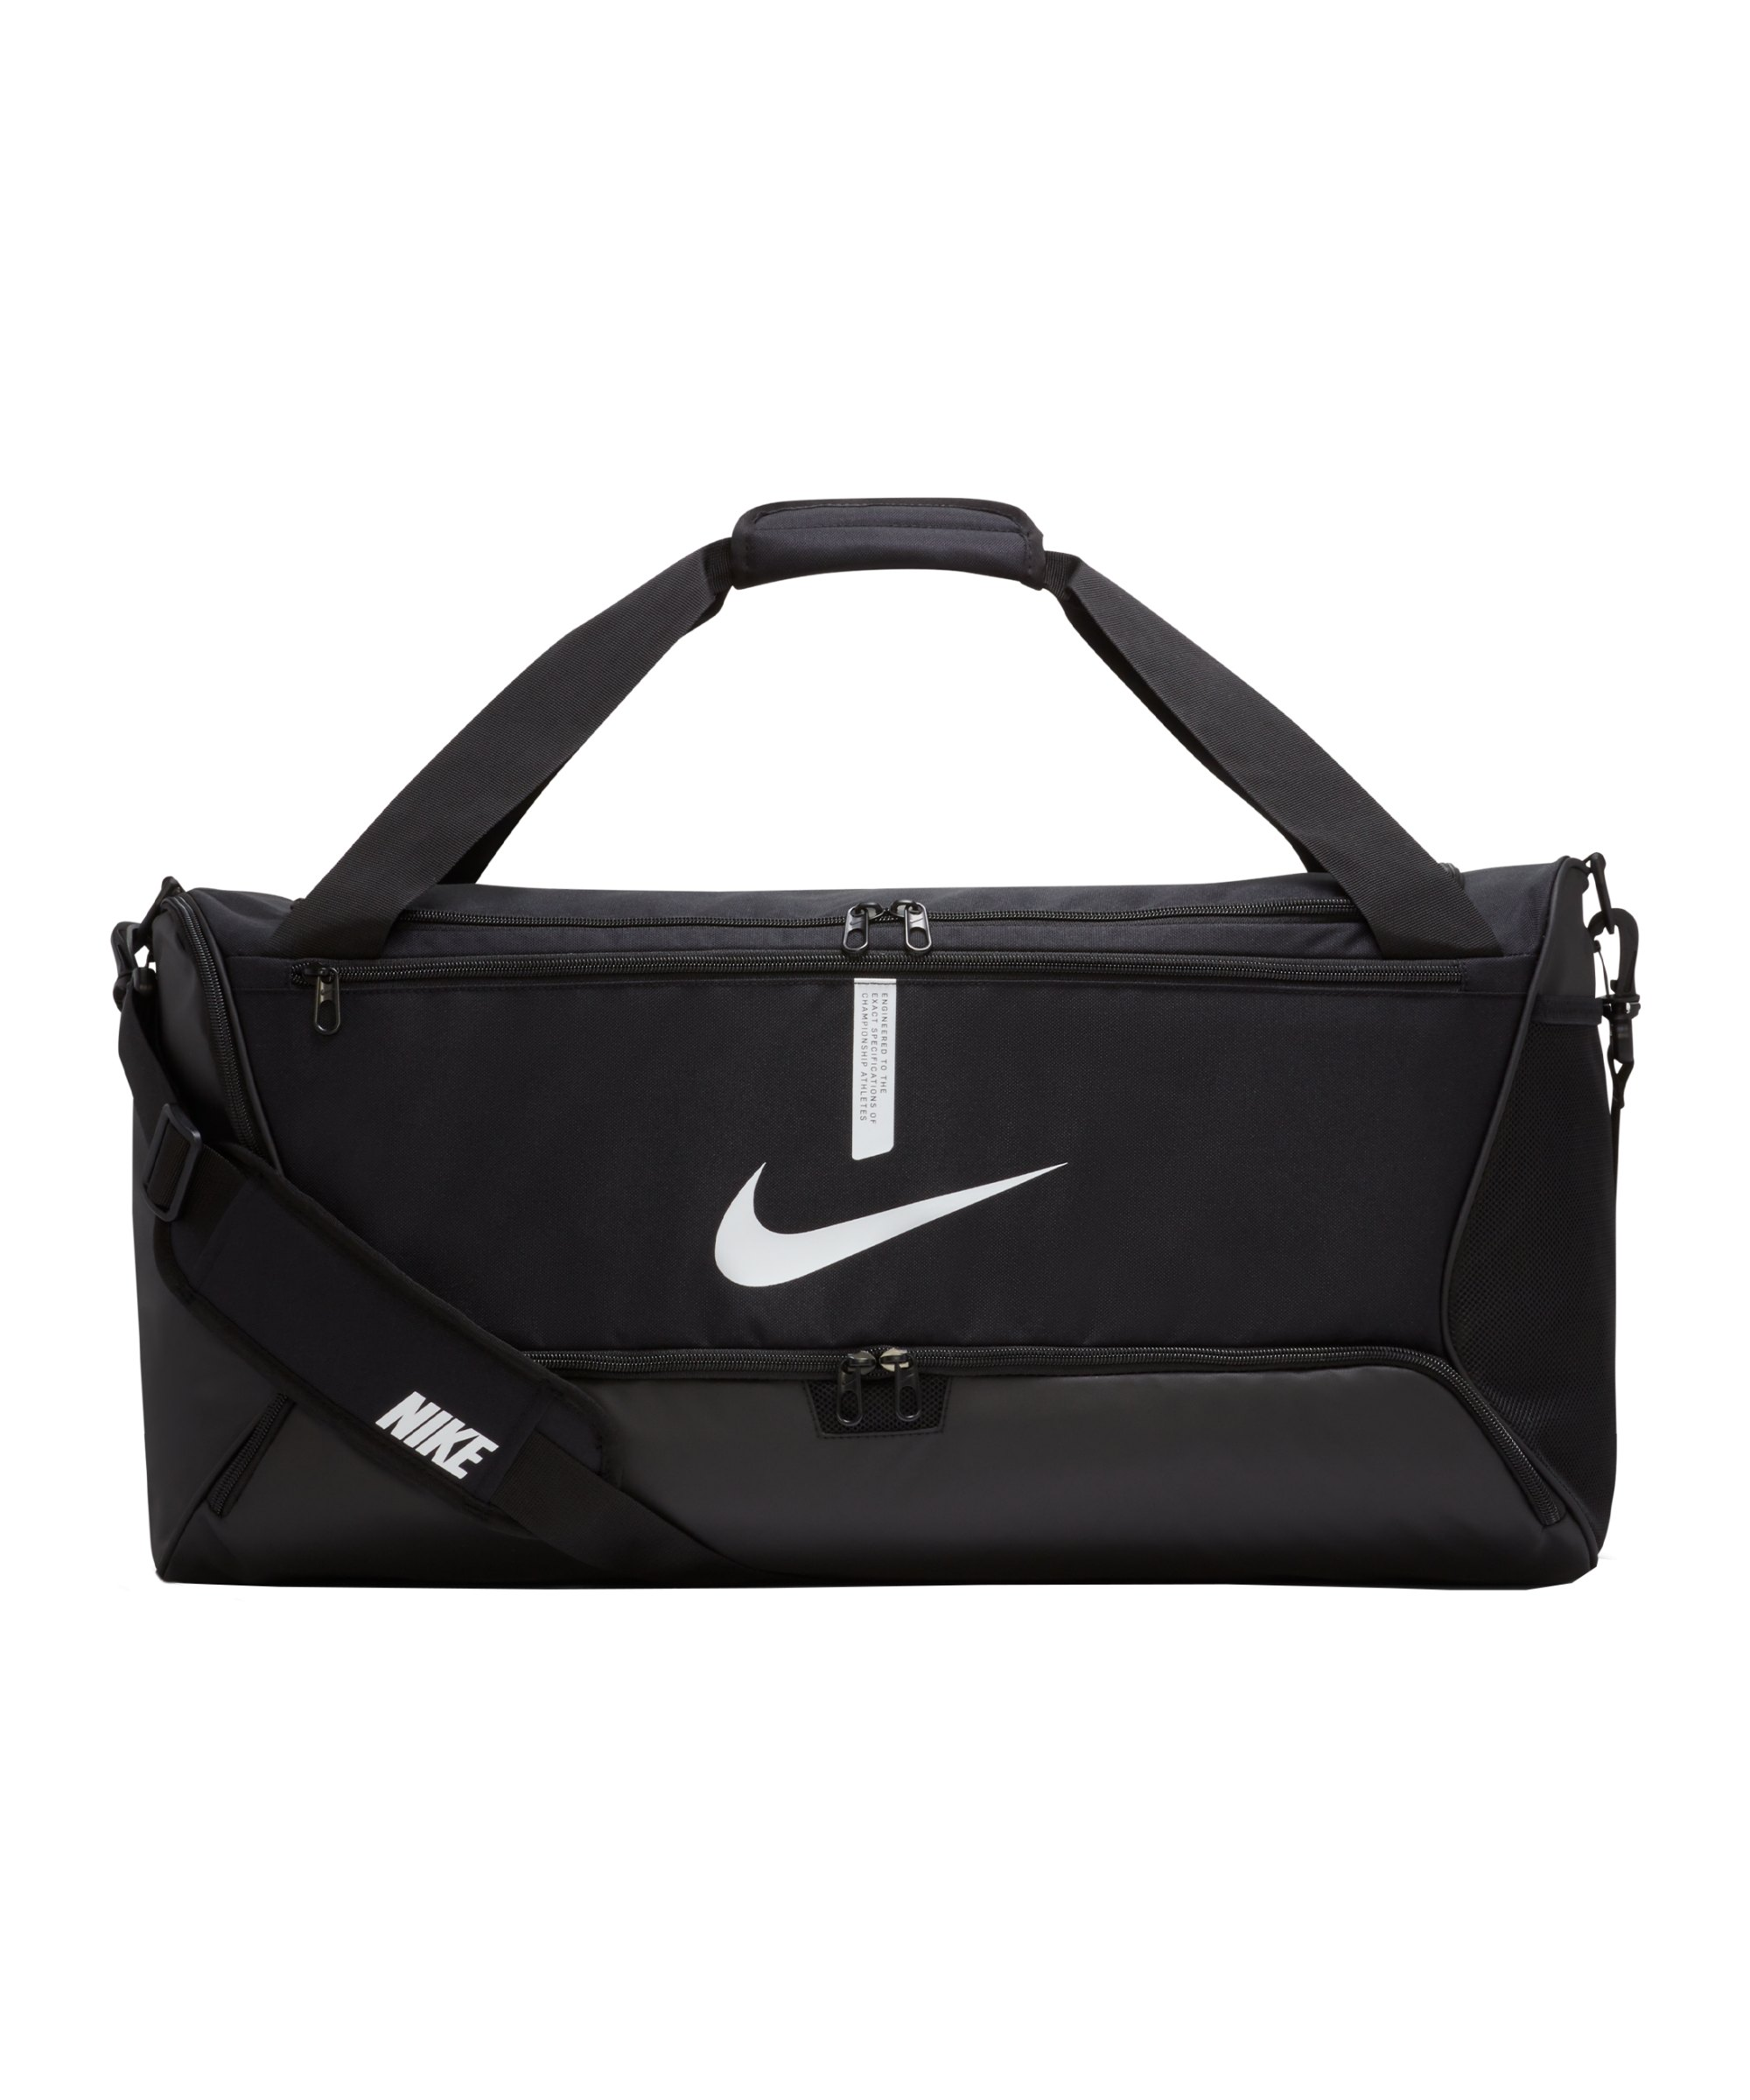 Nike Academy Team Duffel Tasche Medium F010 - schwarz